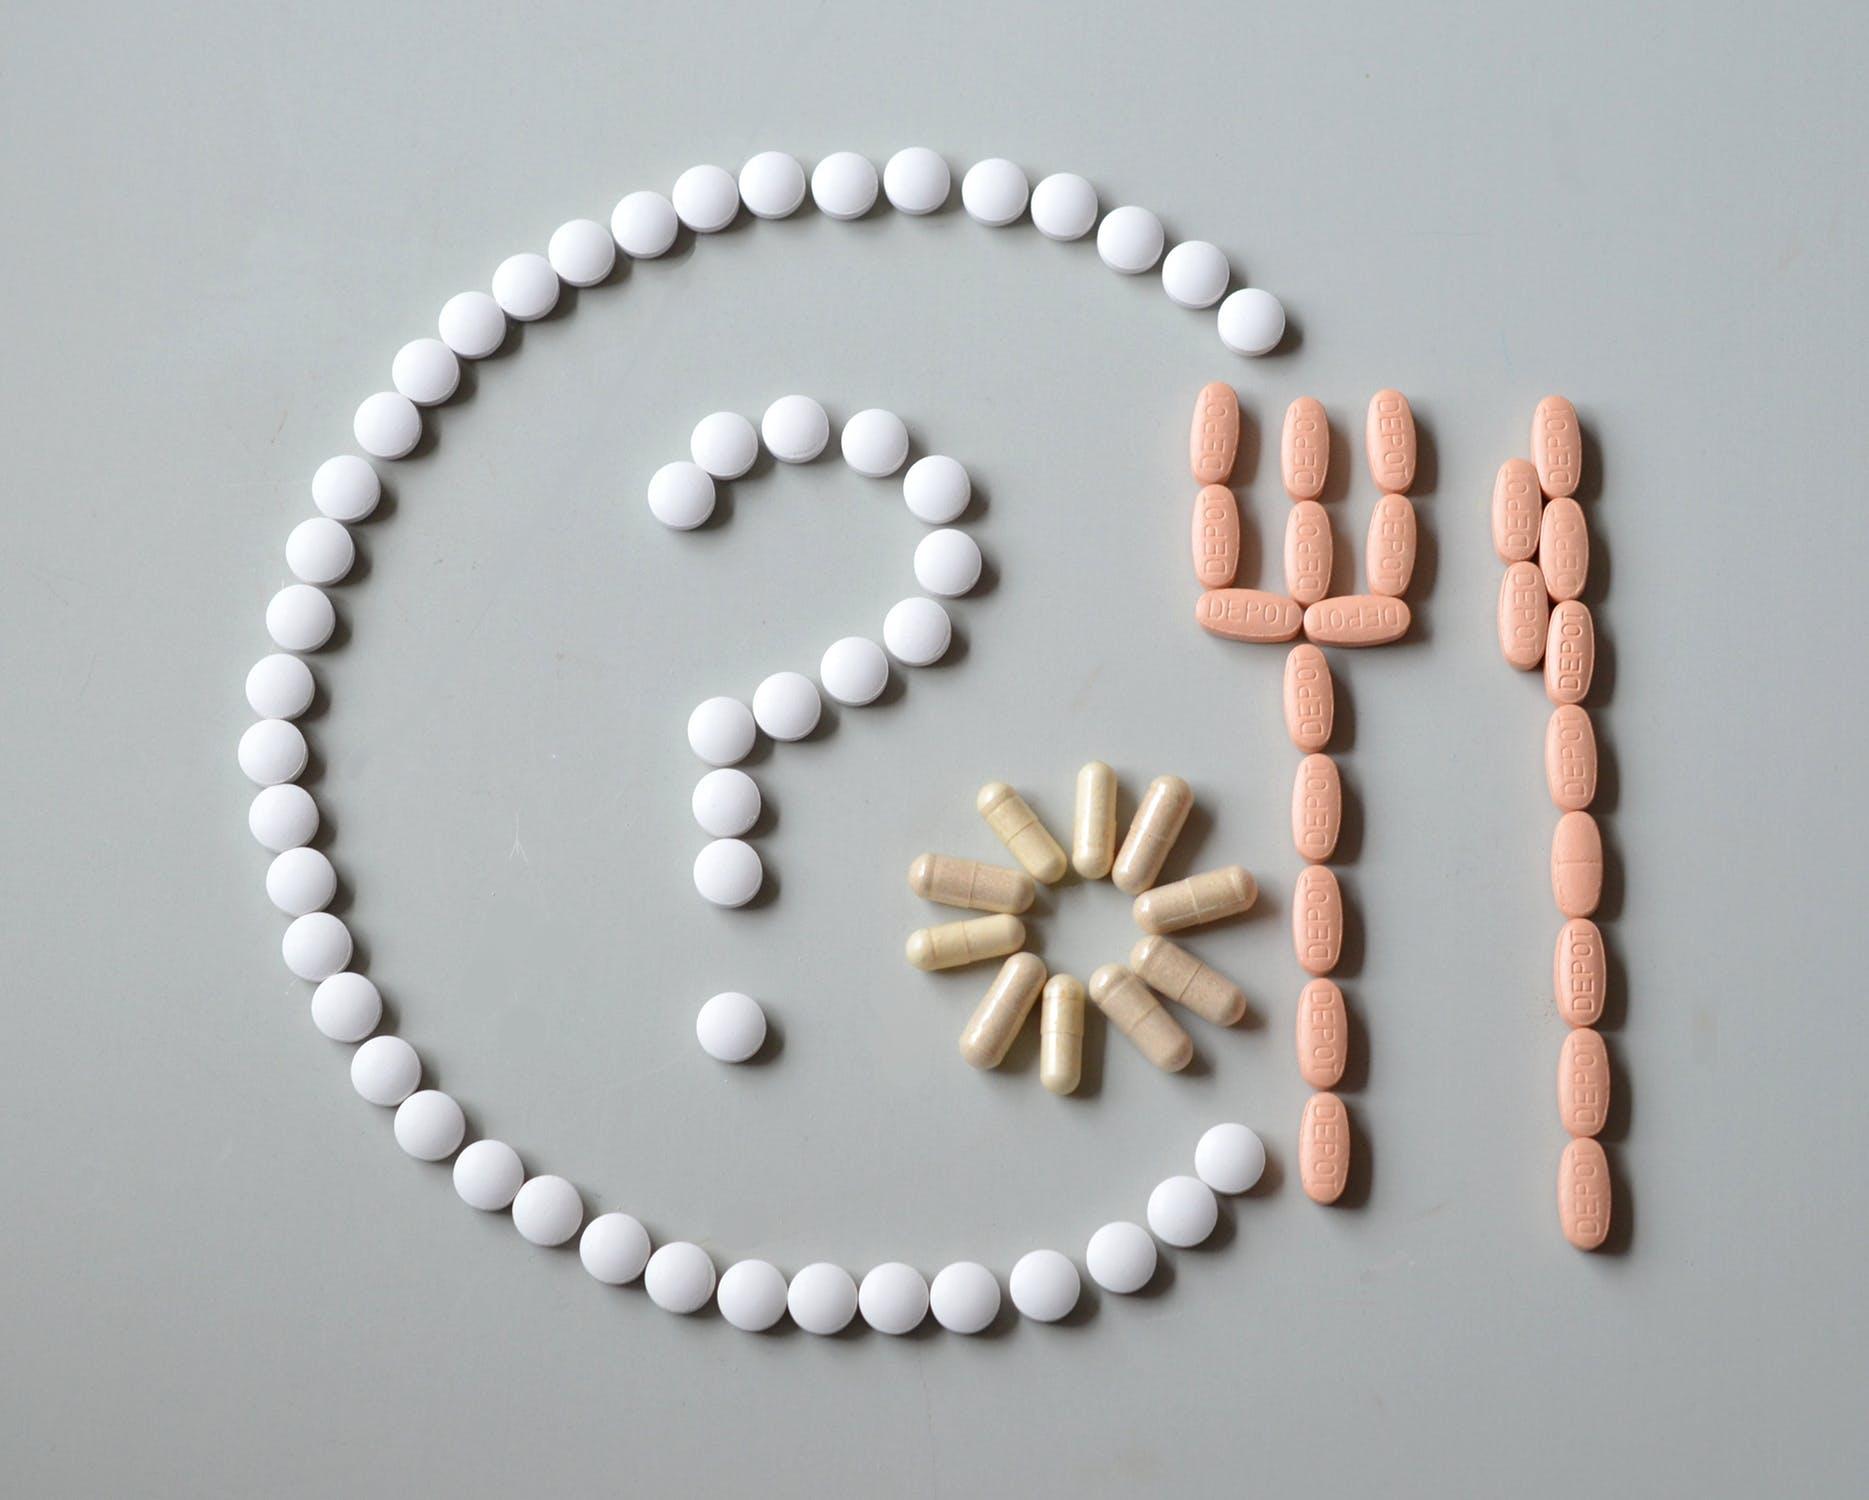 OBESIDADE & ORLITAST | O FAMOSO ALI 🧐💙